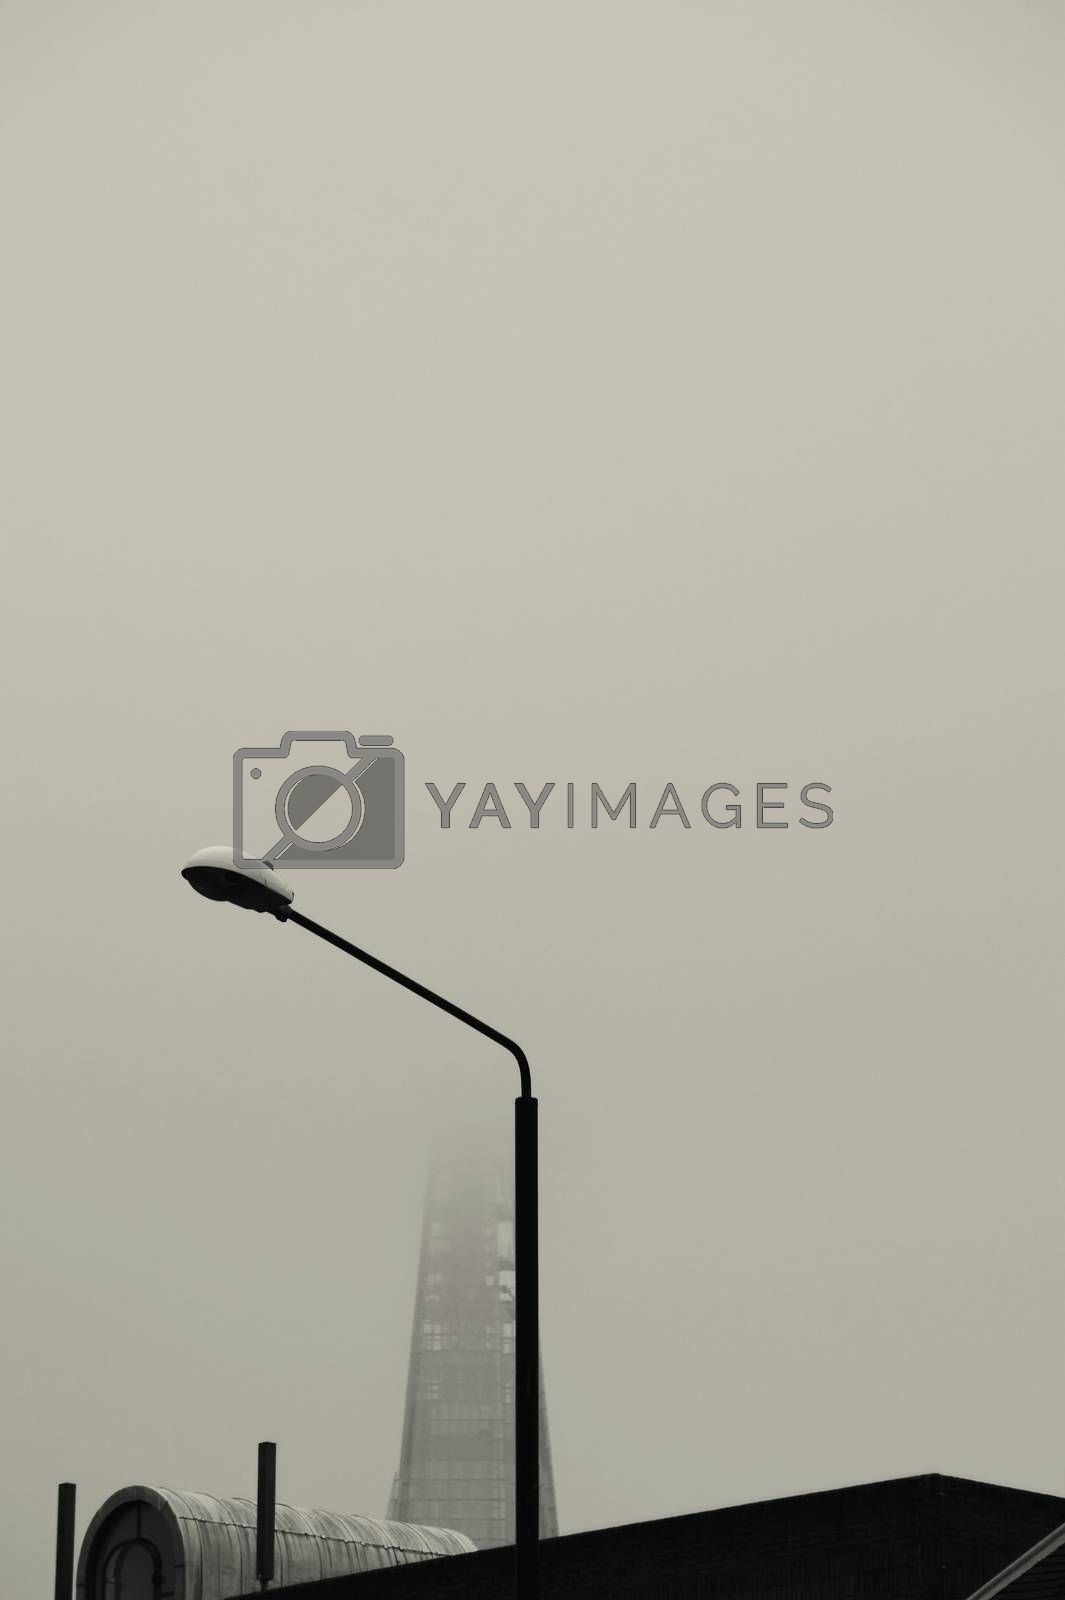 The Shard, a skyscraper in London in the fog.